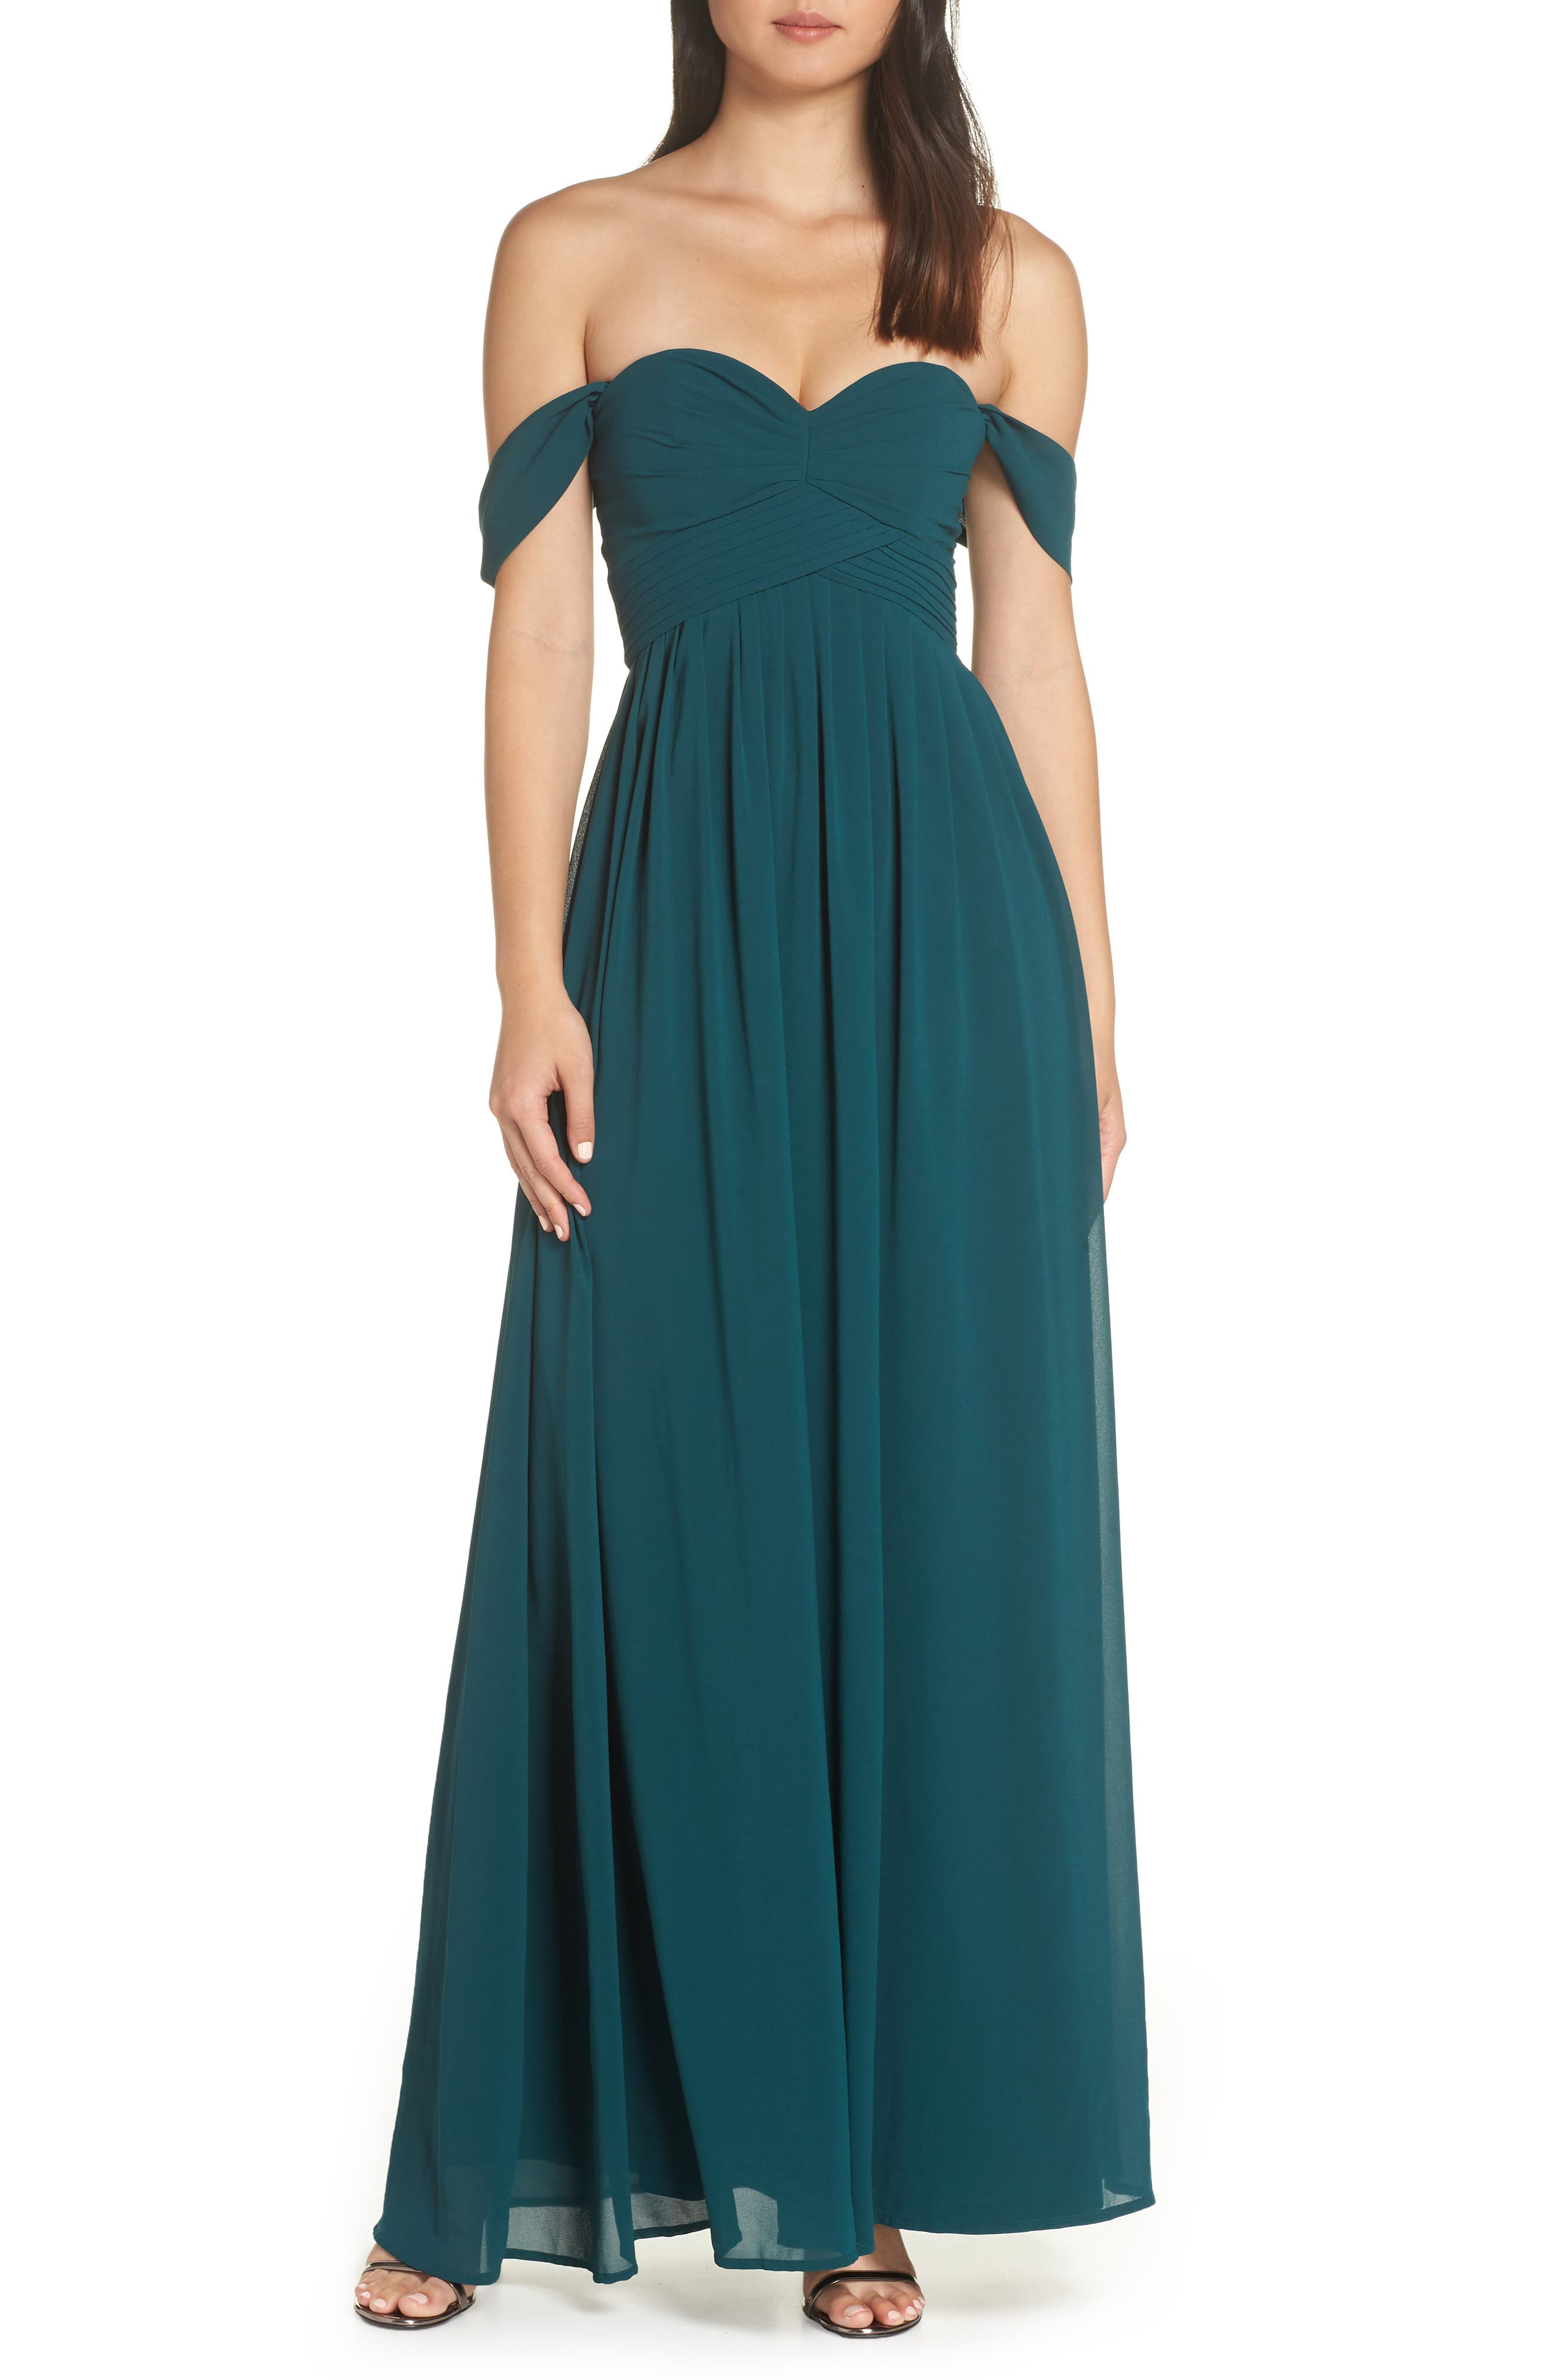 Lulus Convertible Neckline Chiffon Gown, Green